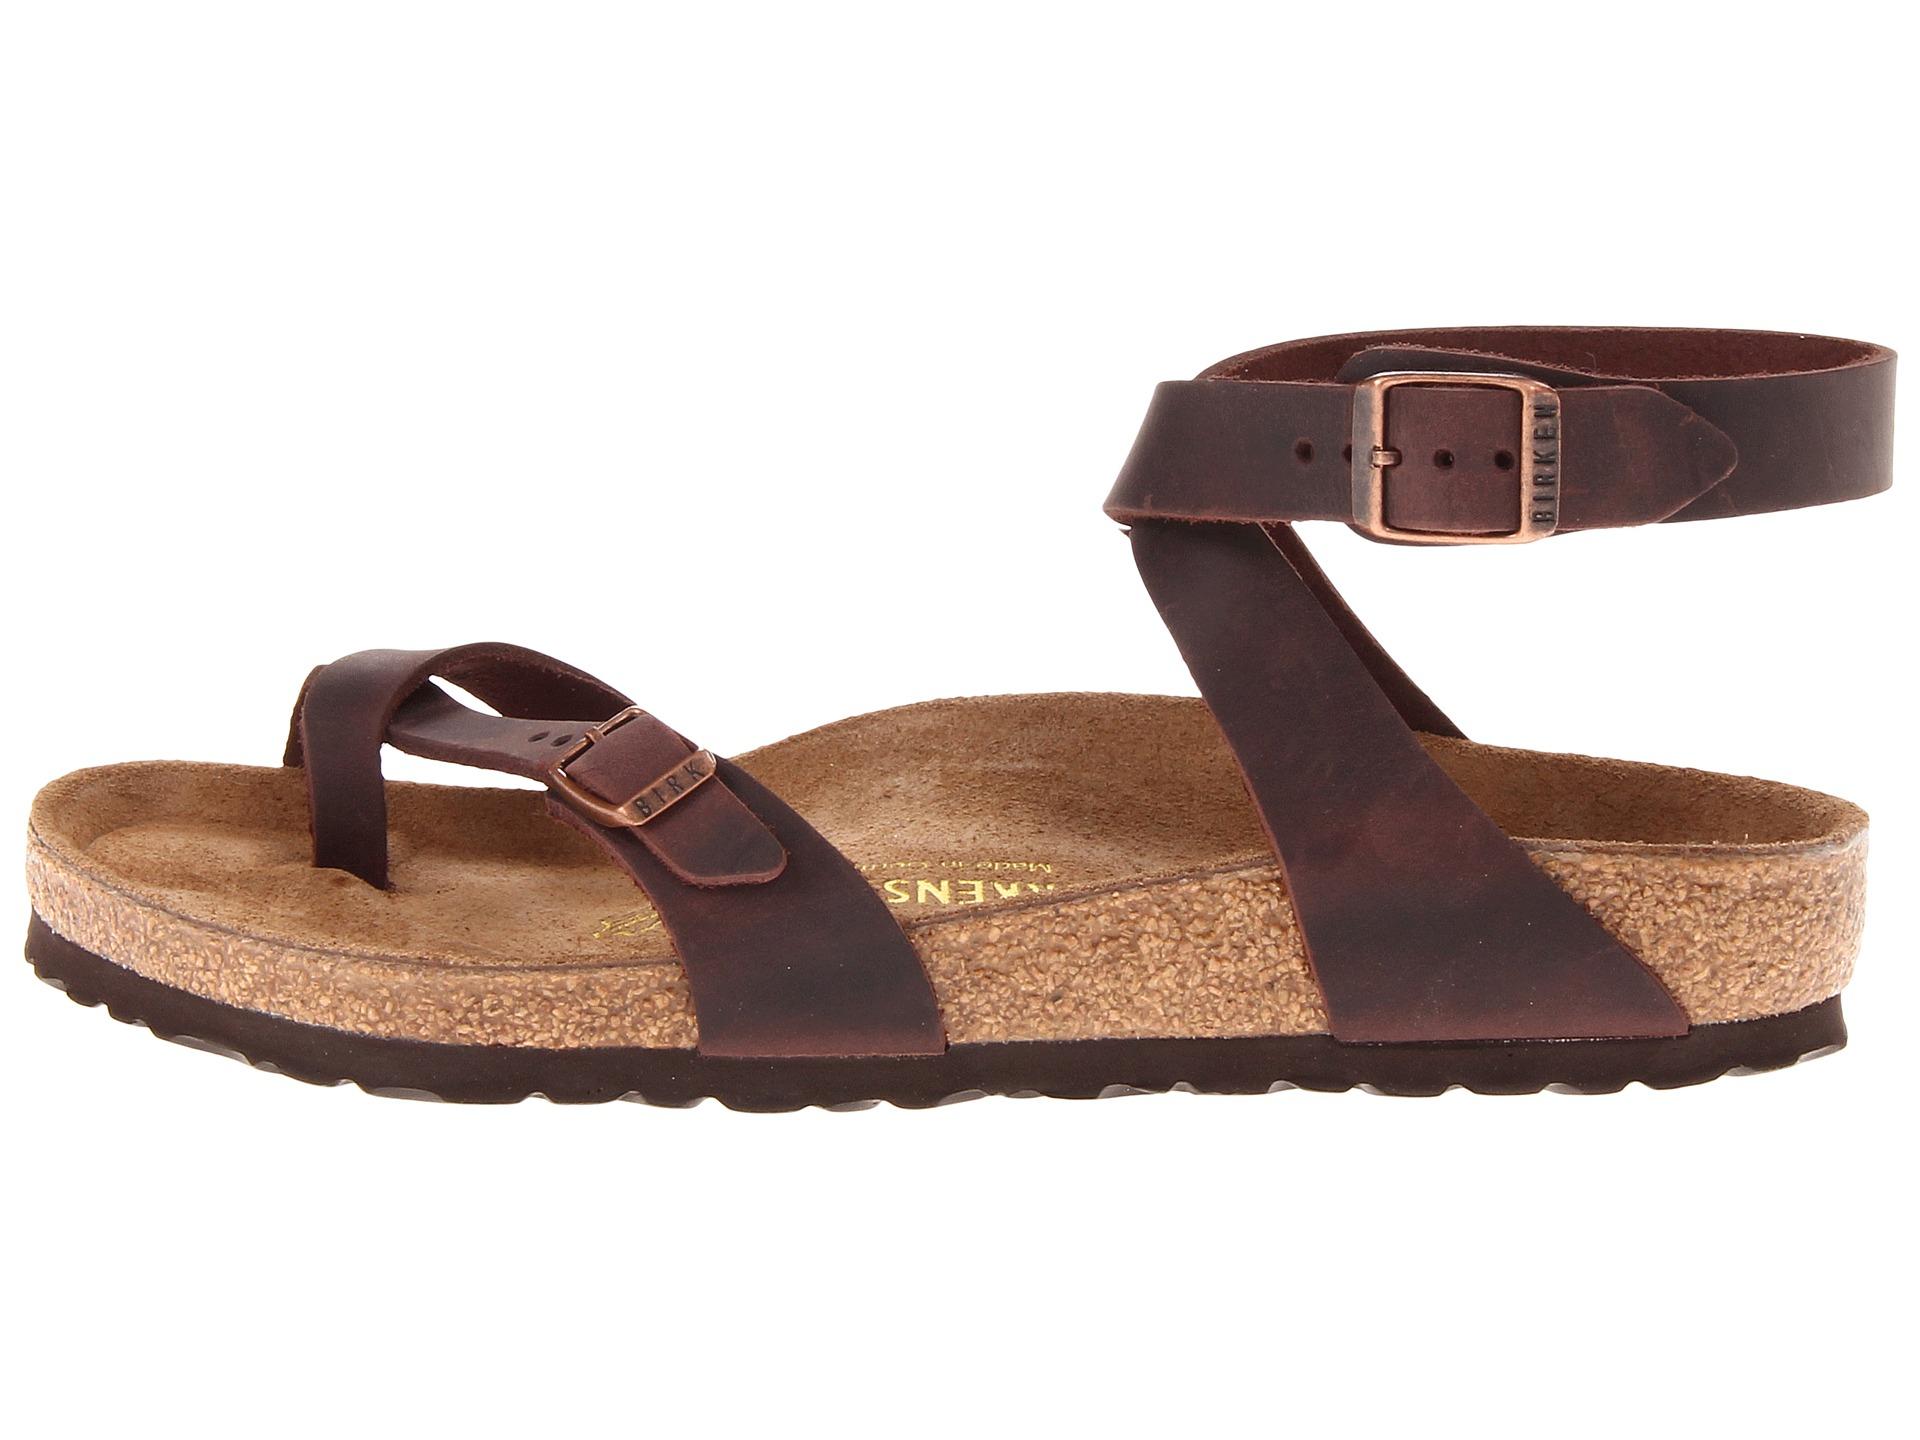 79f013c8d017 Birkenstock Mayari Cross Strap Sandals in Natural (mocha .